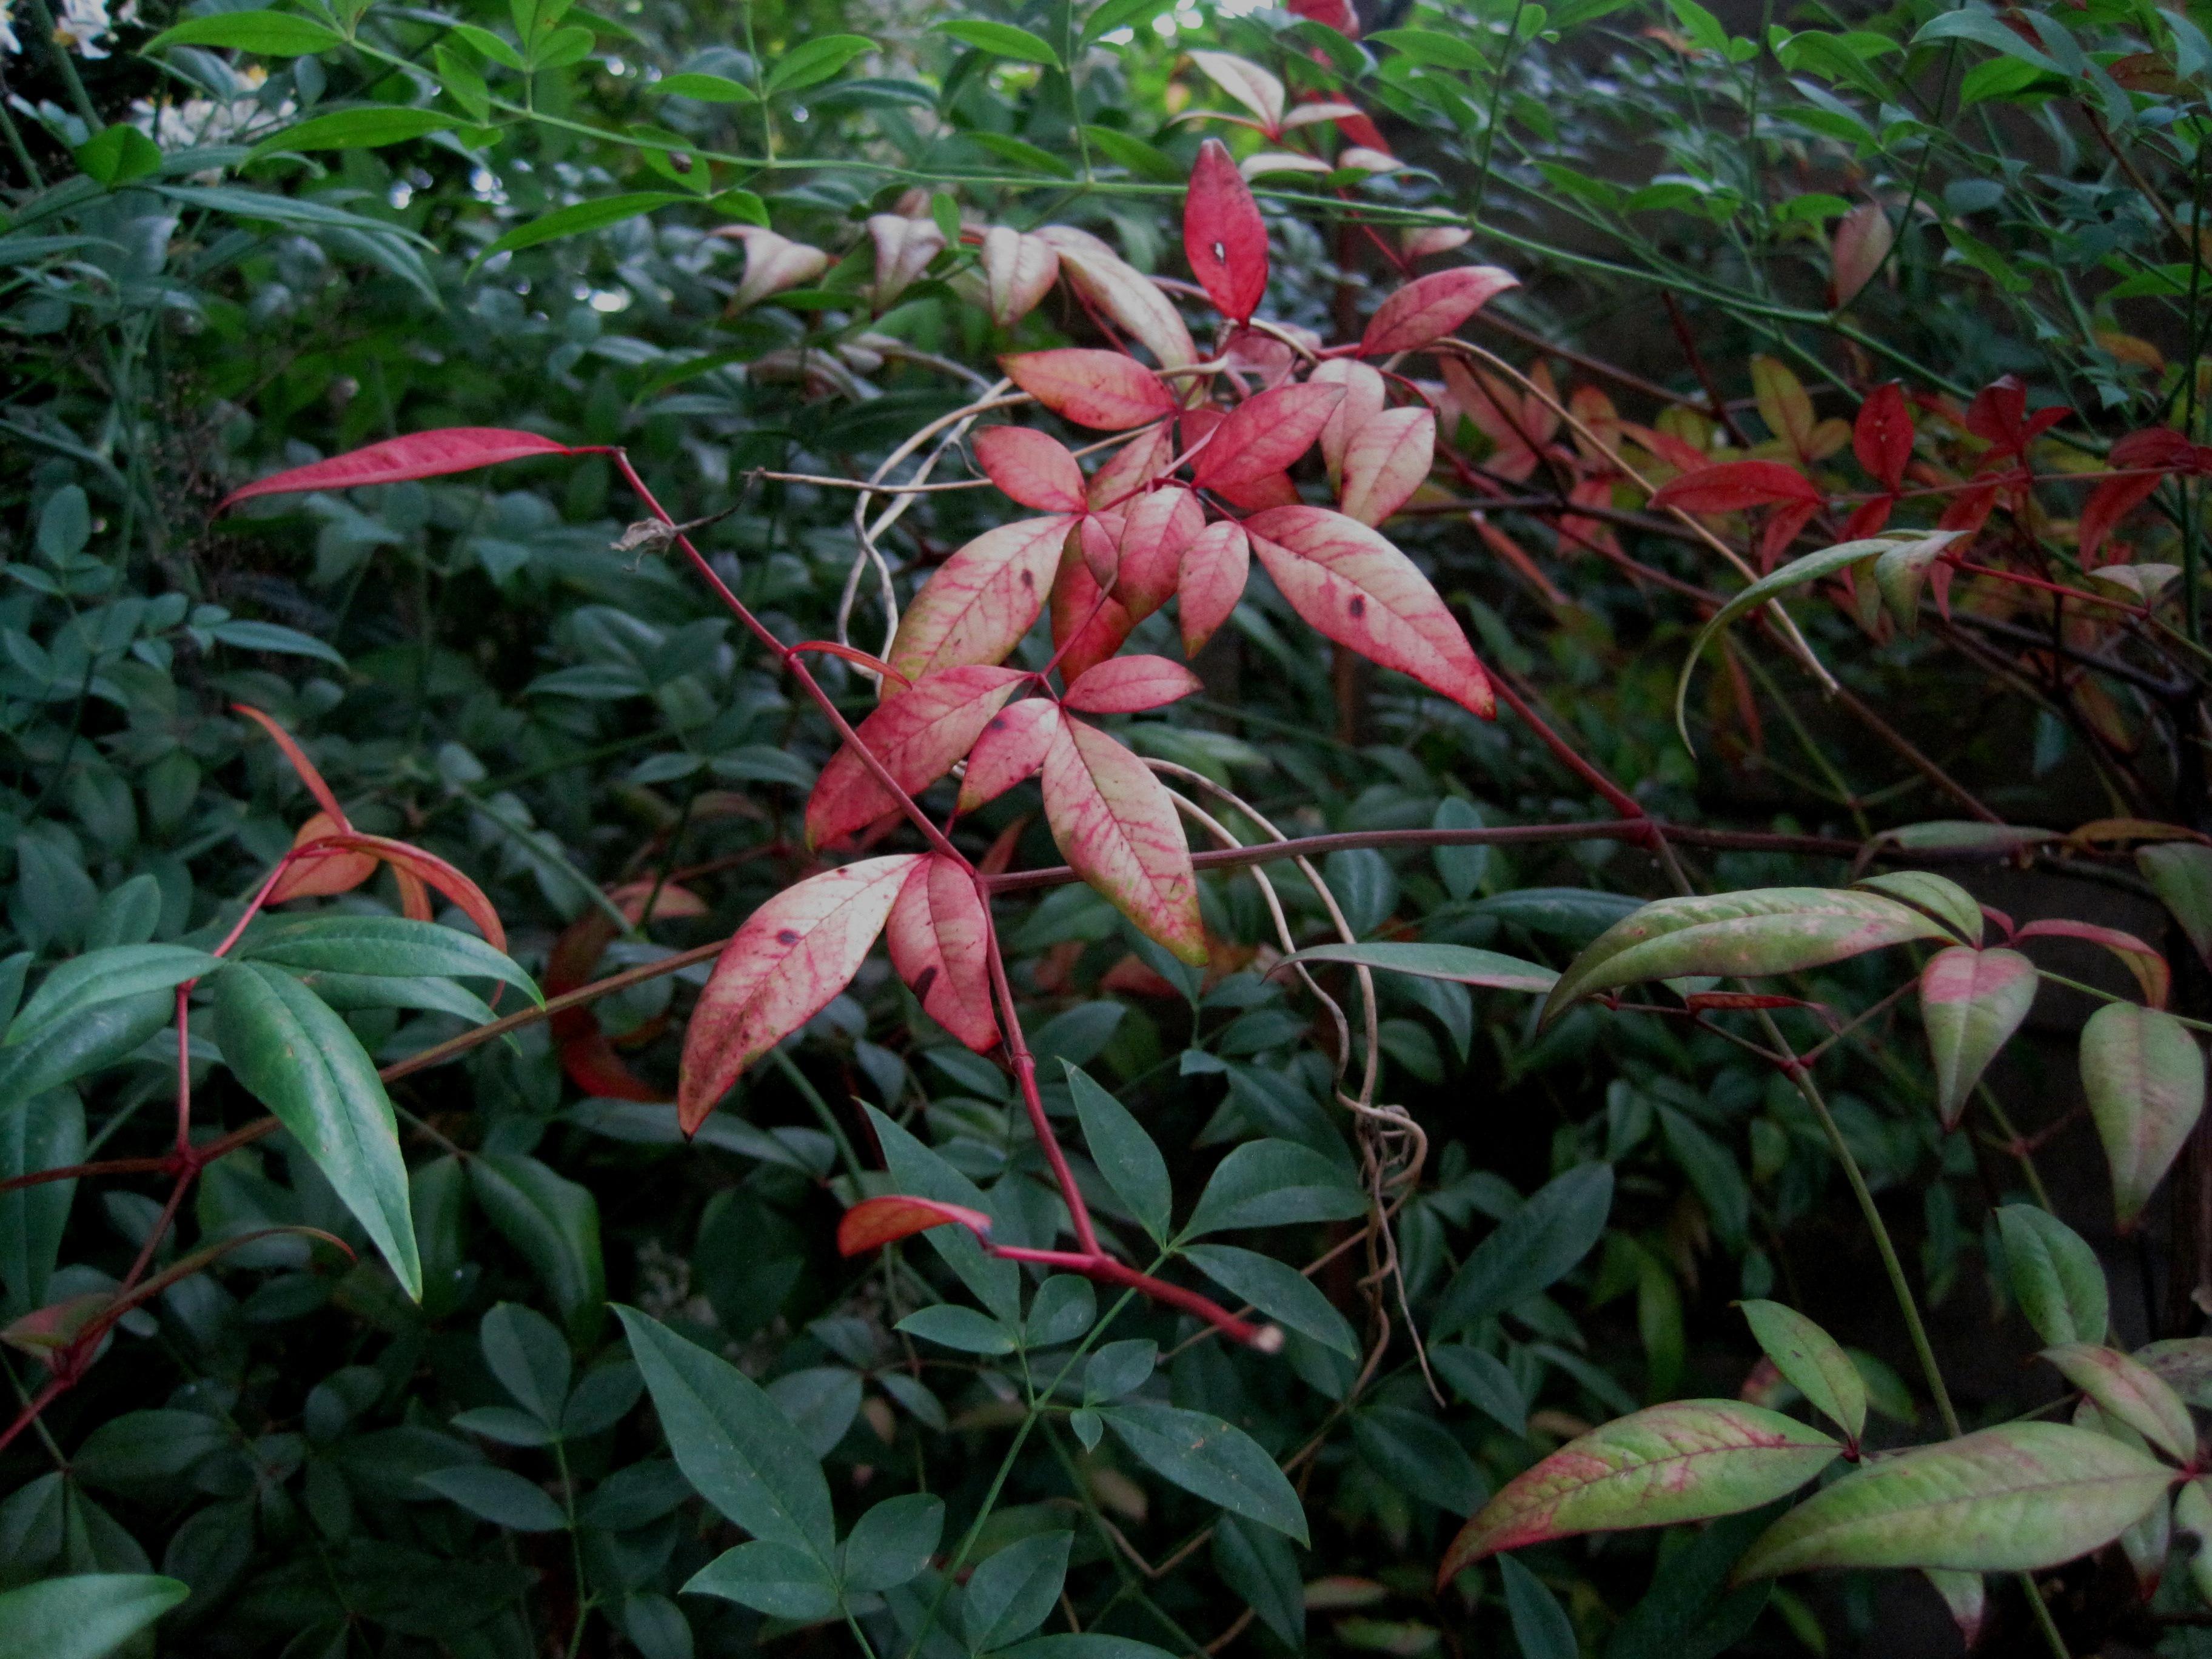 Kostenlose Foto Blatt Blume Rot Botanik Garten Flora Blatter